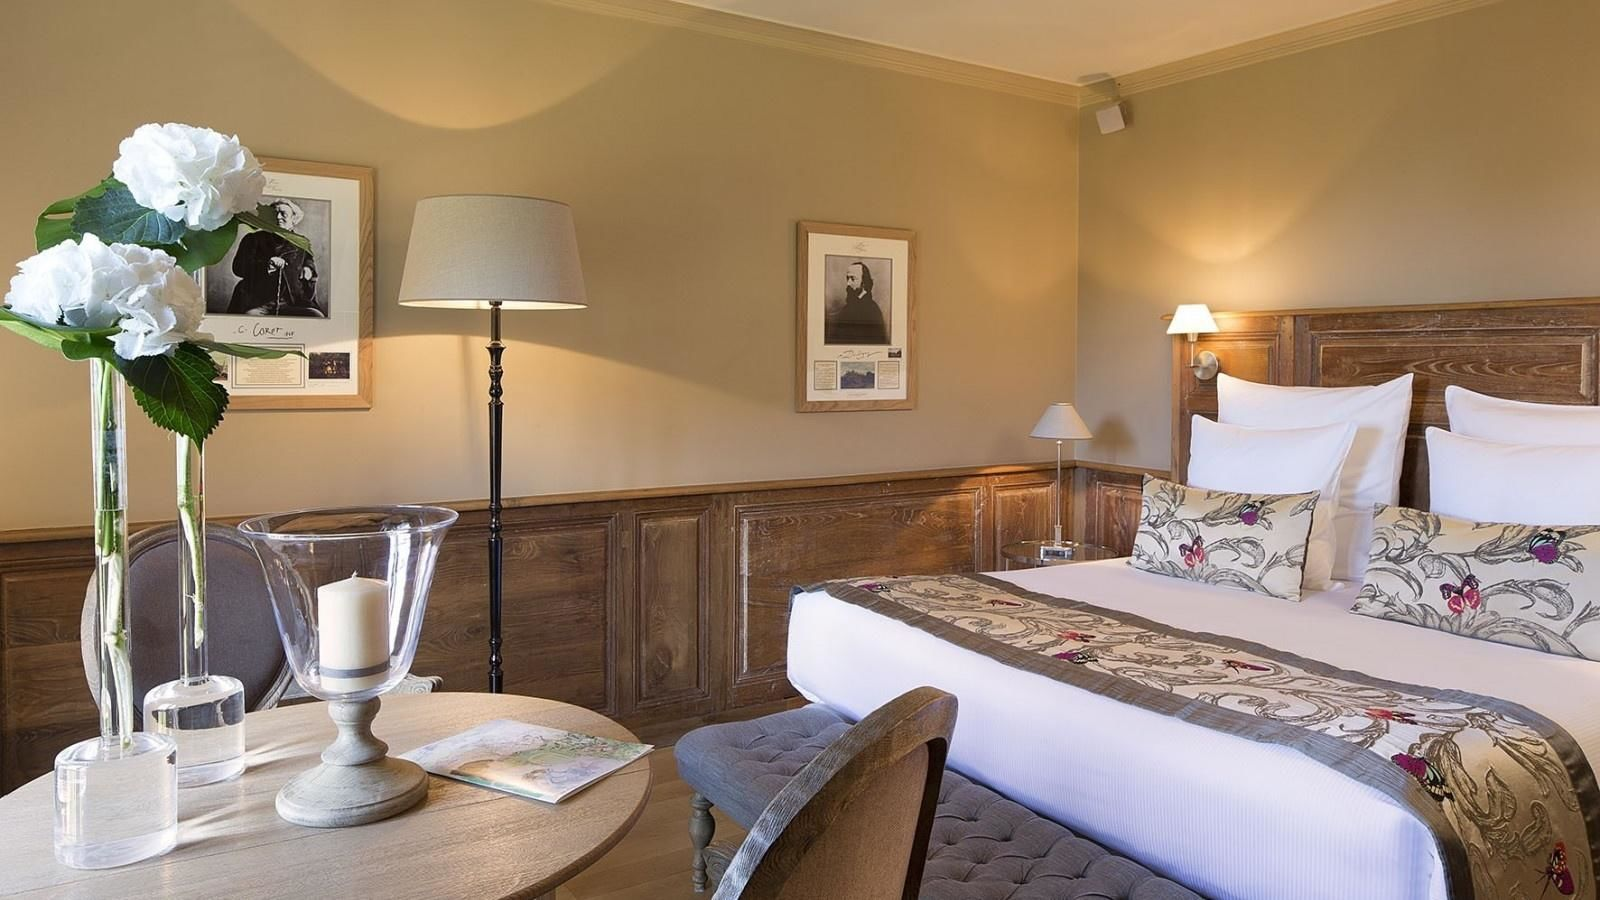 Hotel La Ferme Saint Simeon - Superior Double Room